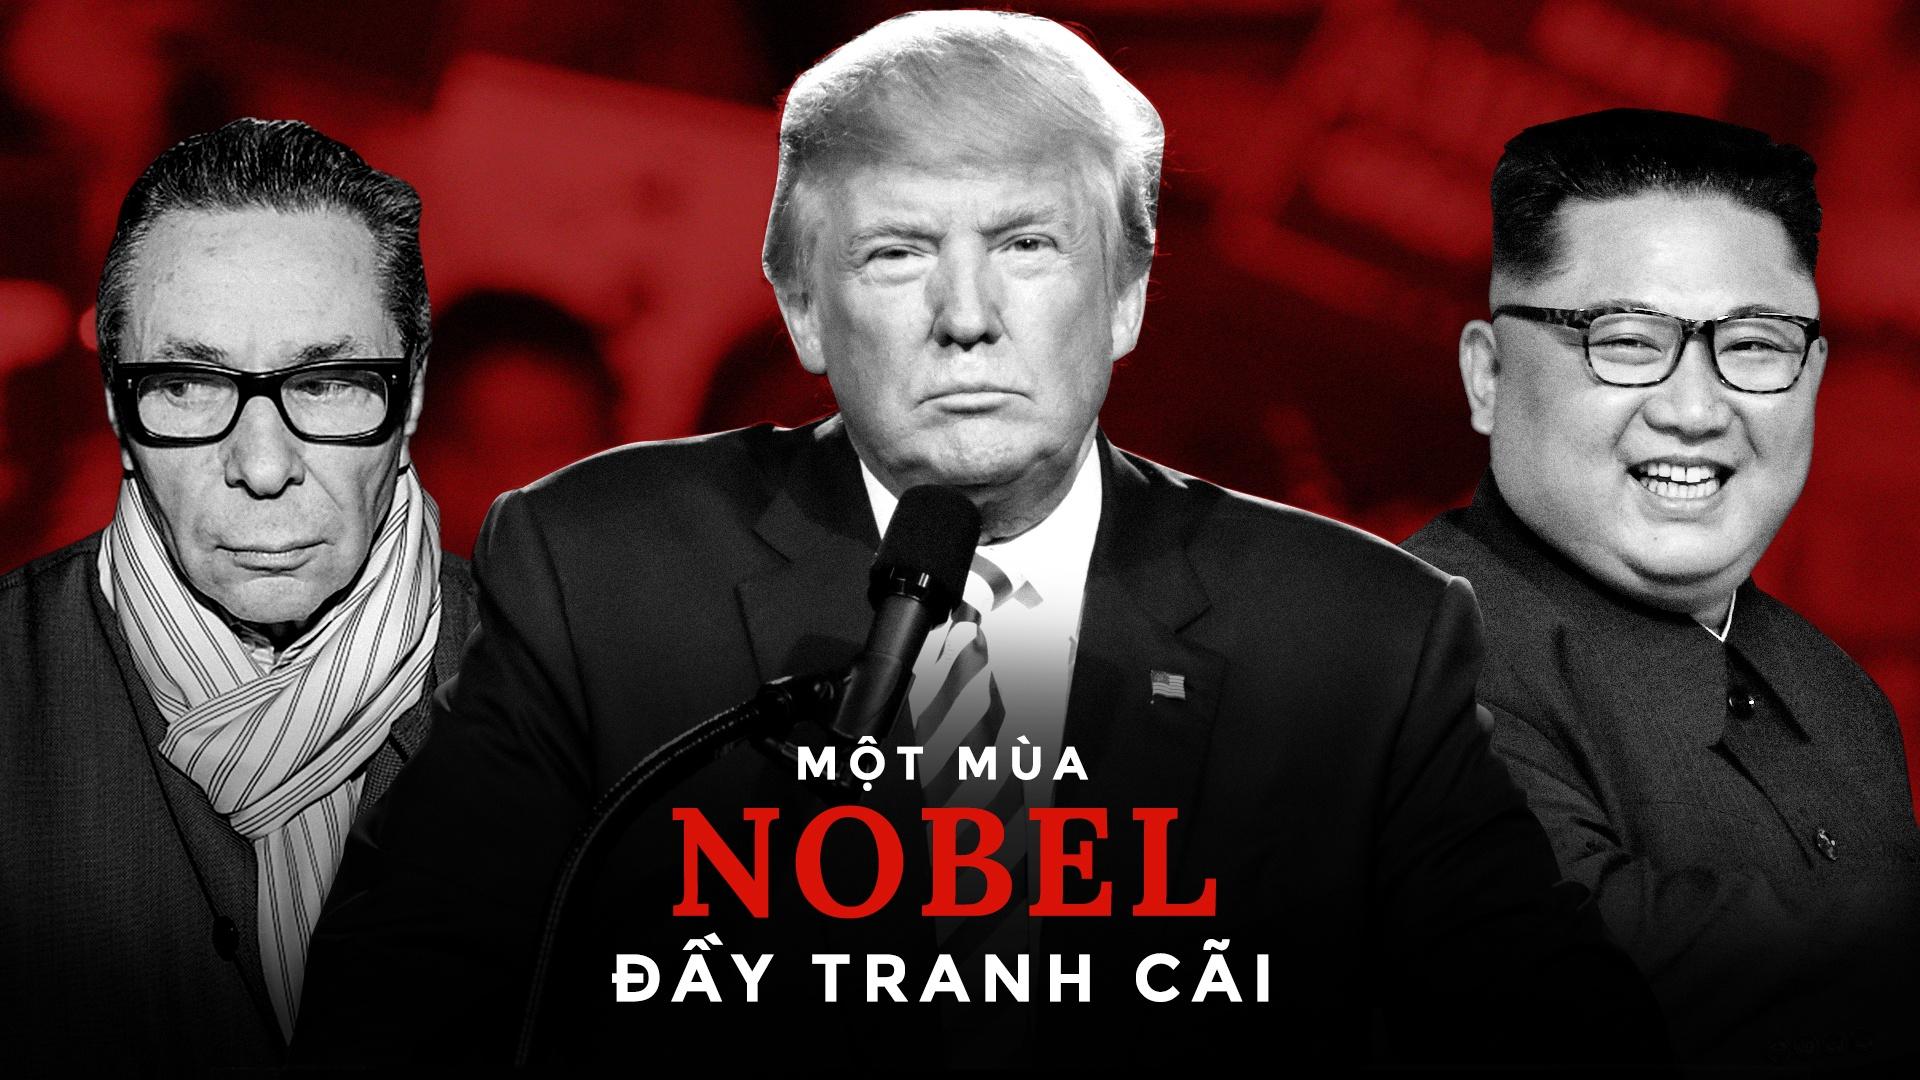 Mua Nobel tranh cai - Huy giai van hoc, TT Trump nhan Nobel Hoa binh? hinh anh 2